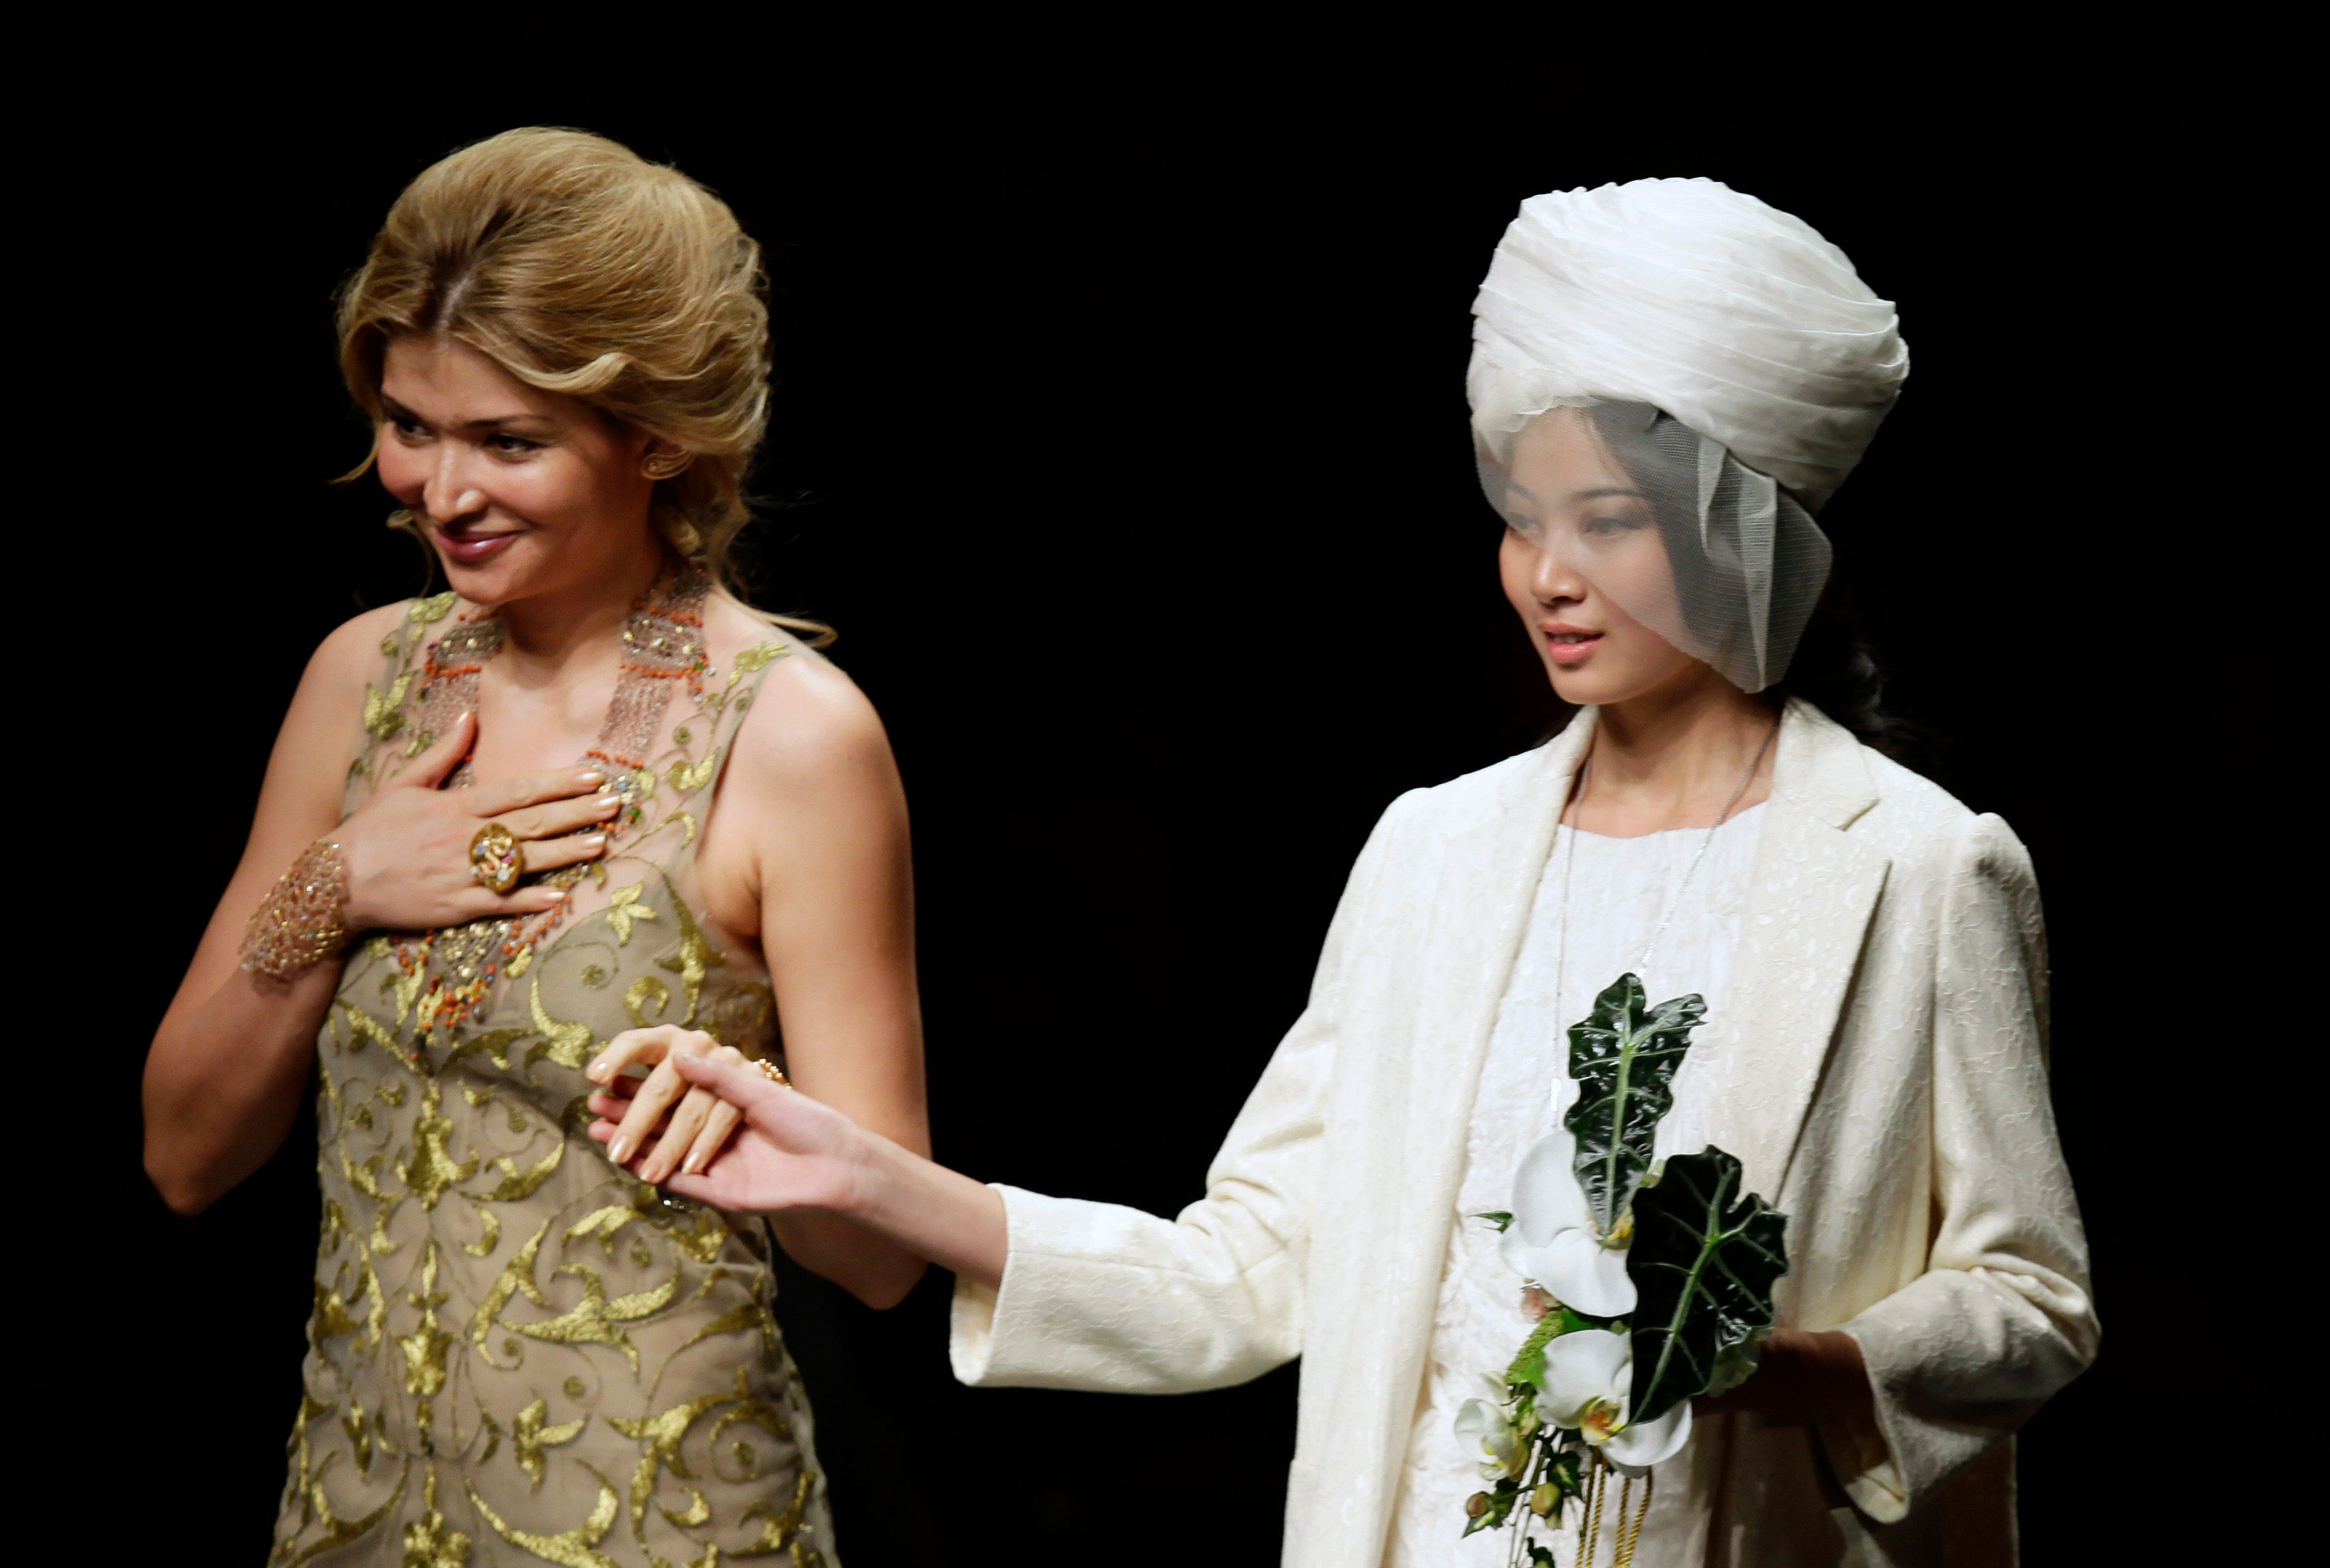 Gulnara Karimova, la fille aînée d'Islom Karimov, président de l'Ouzbékistan.